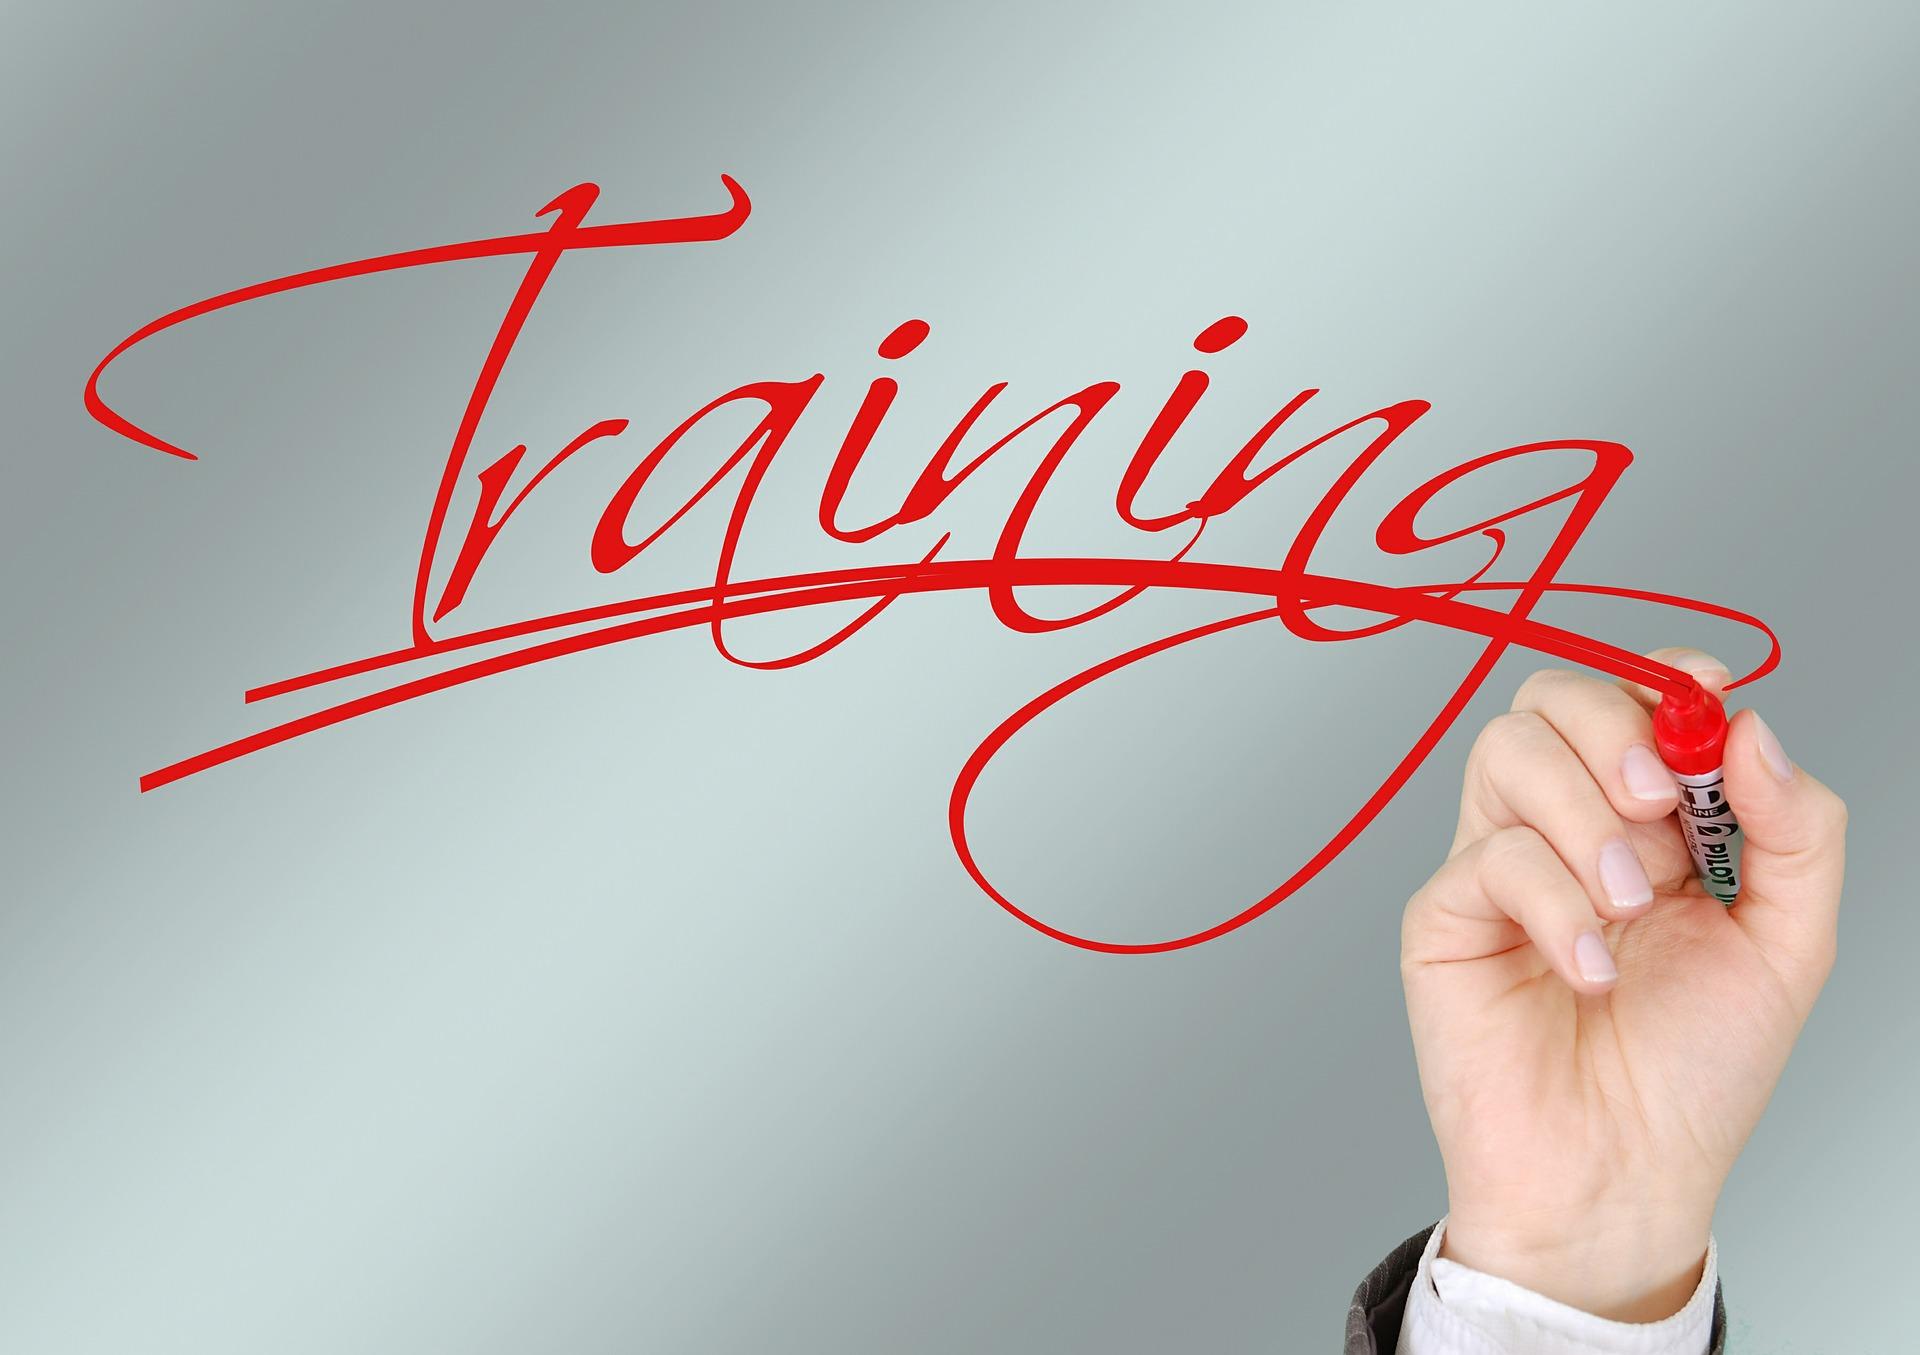 ITメディアラーニング   ITMediaLearning